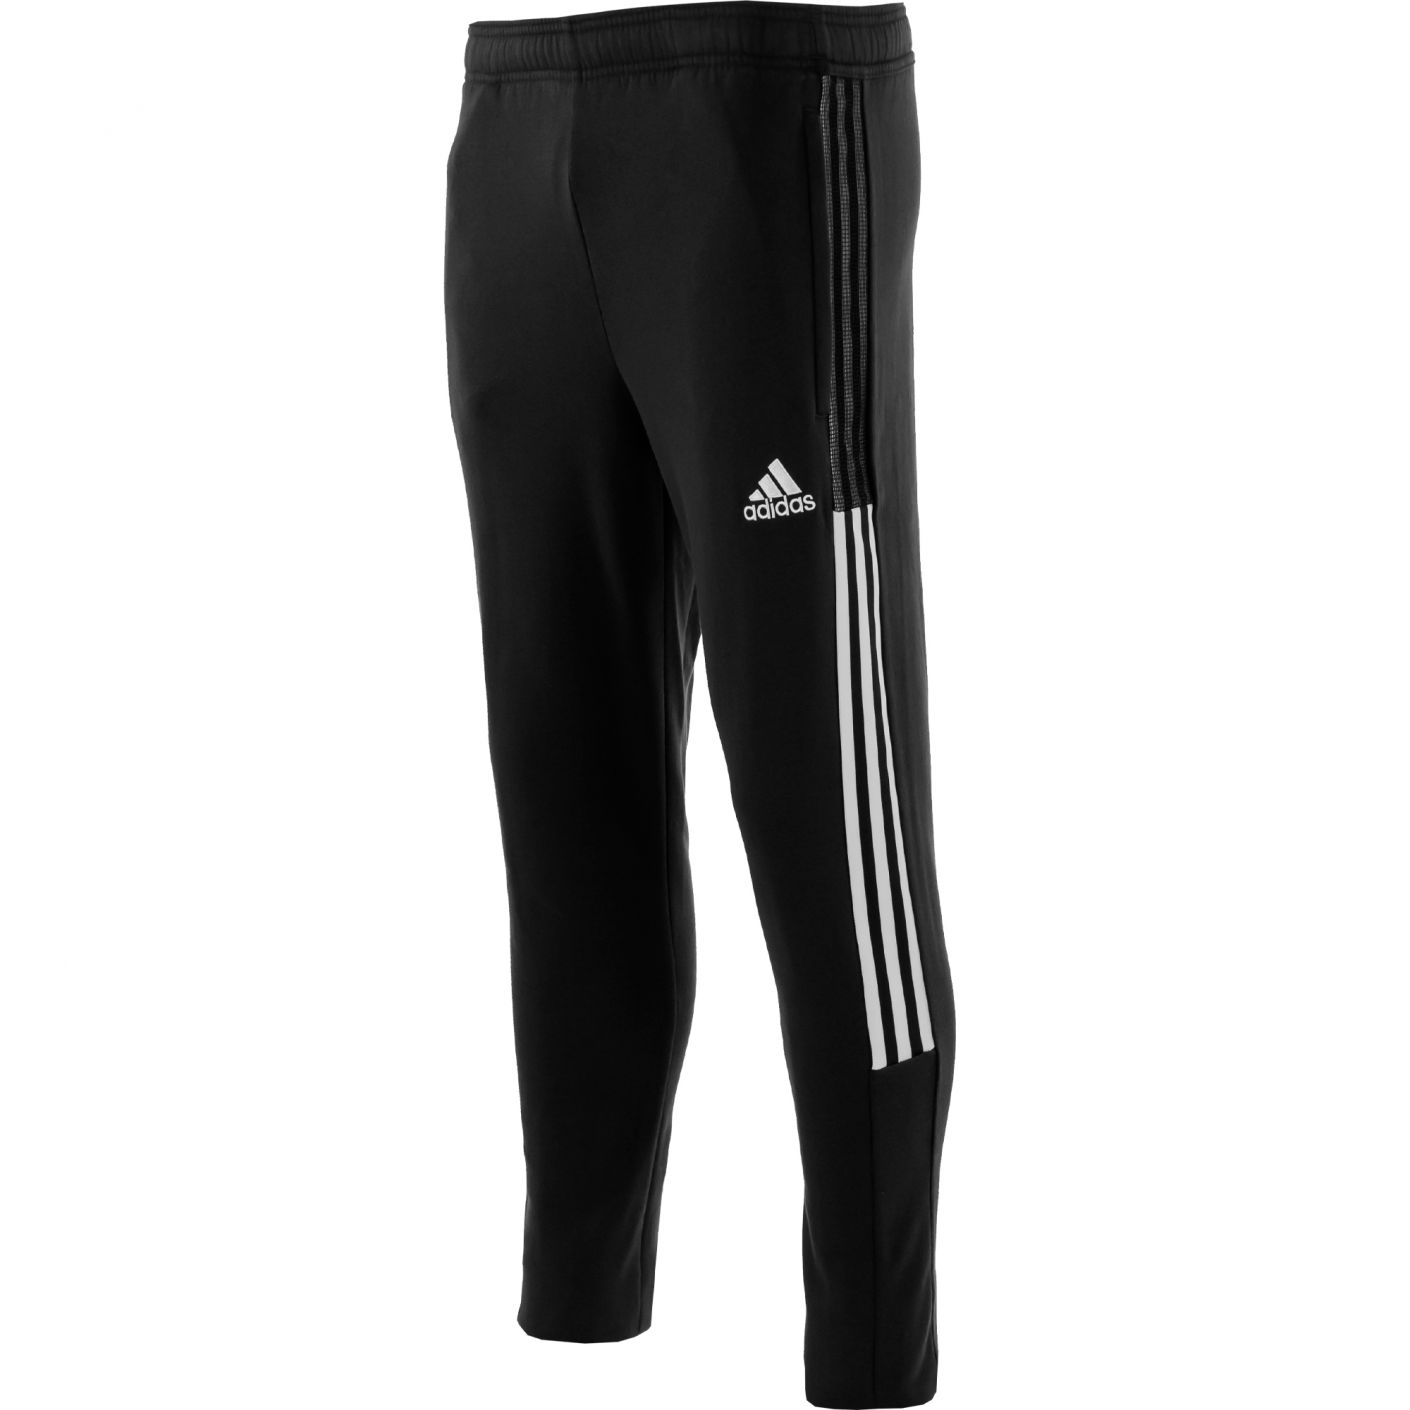 adidas Tiro 21 Sweat Trainingsbroek Zwart Wit